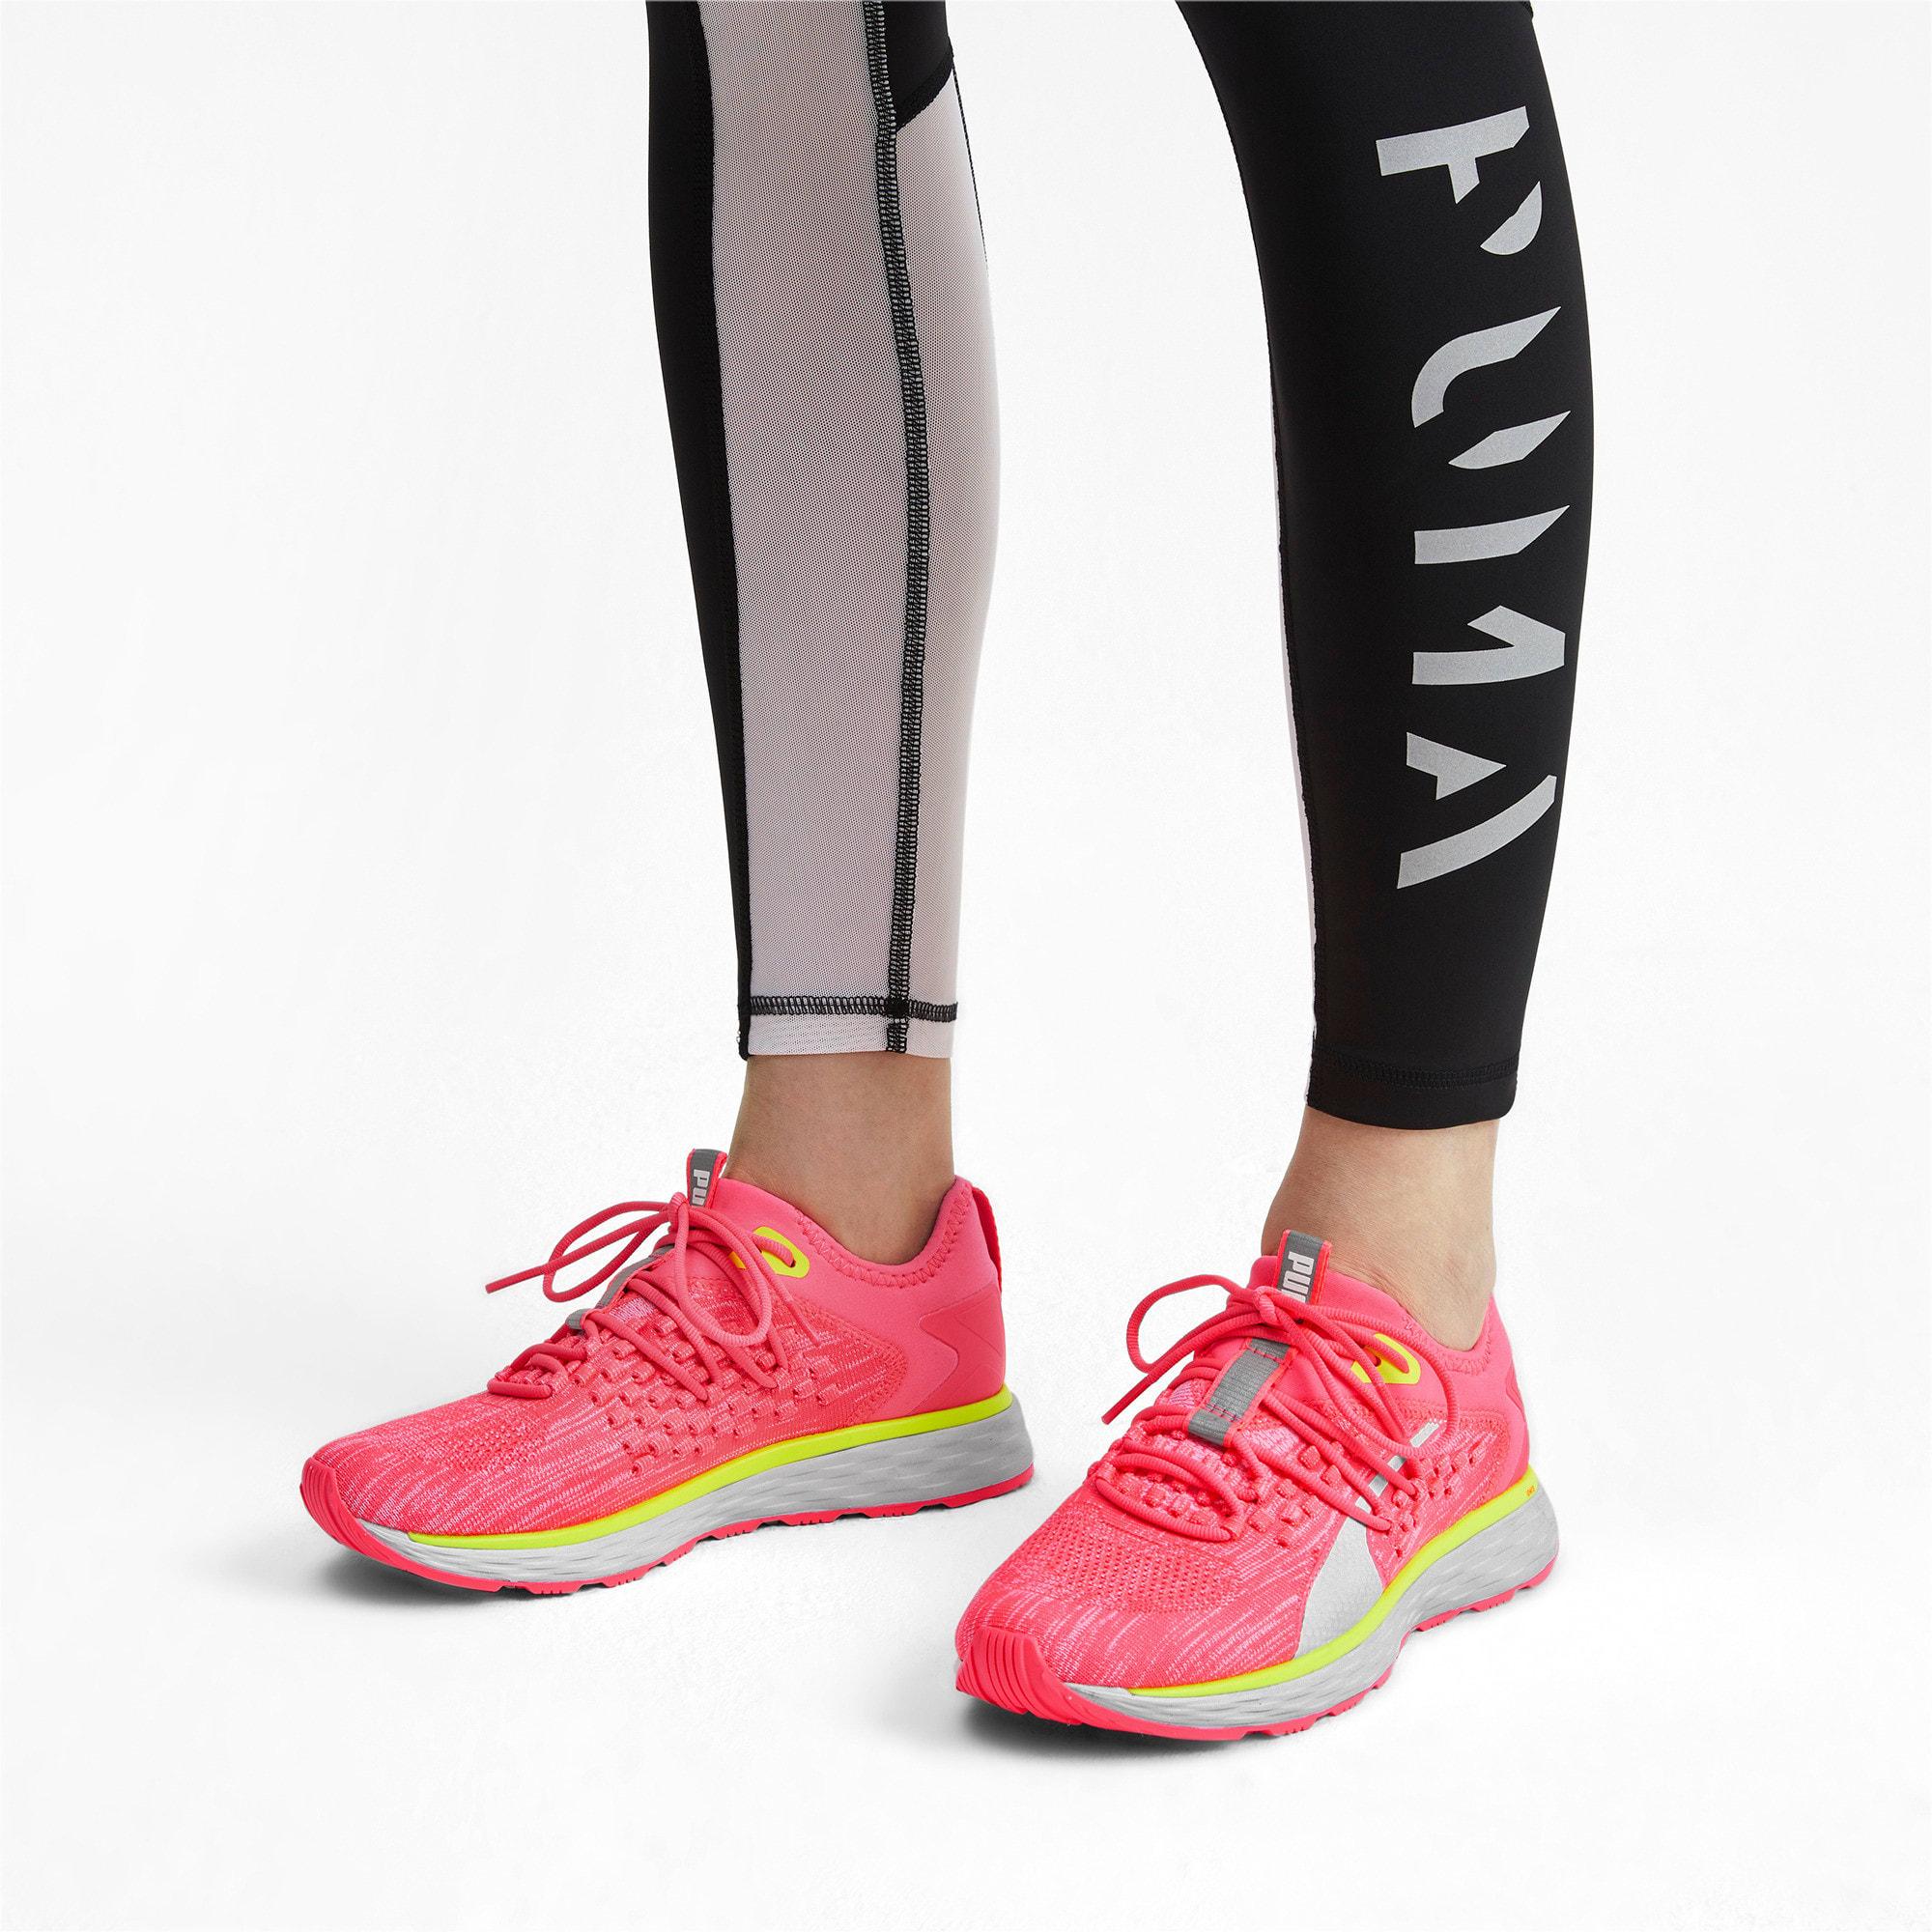 Thumbnail 2 of SPEED FUSEFIT Women's Running Shoes, Pink Alert-Puma White, medium